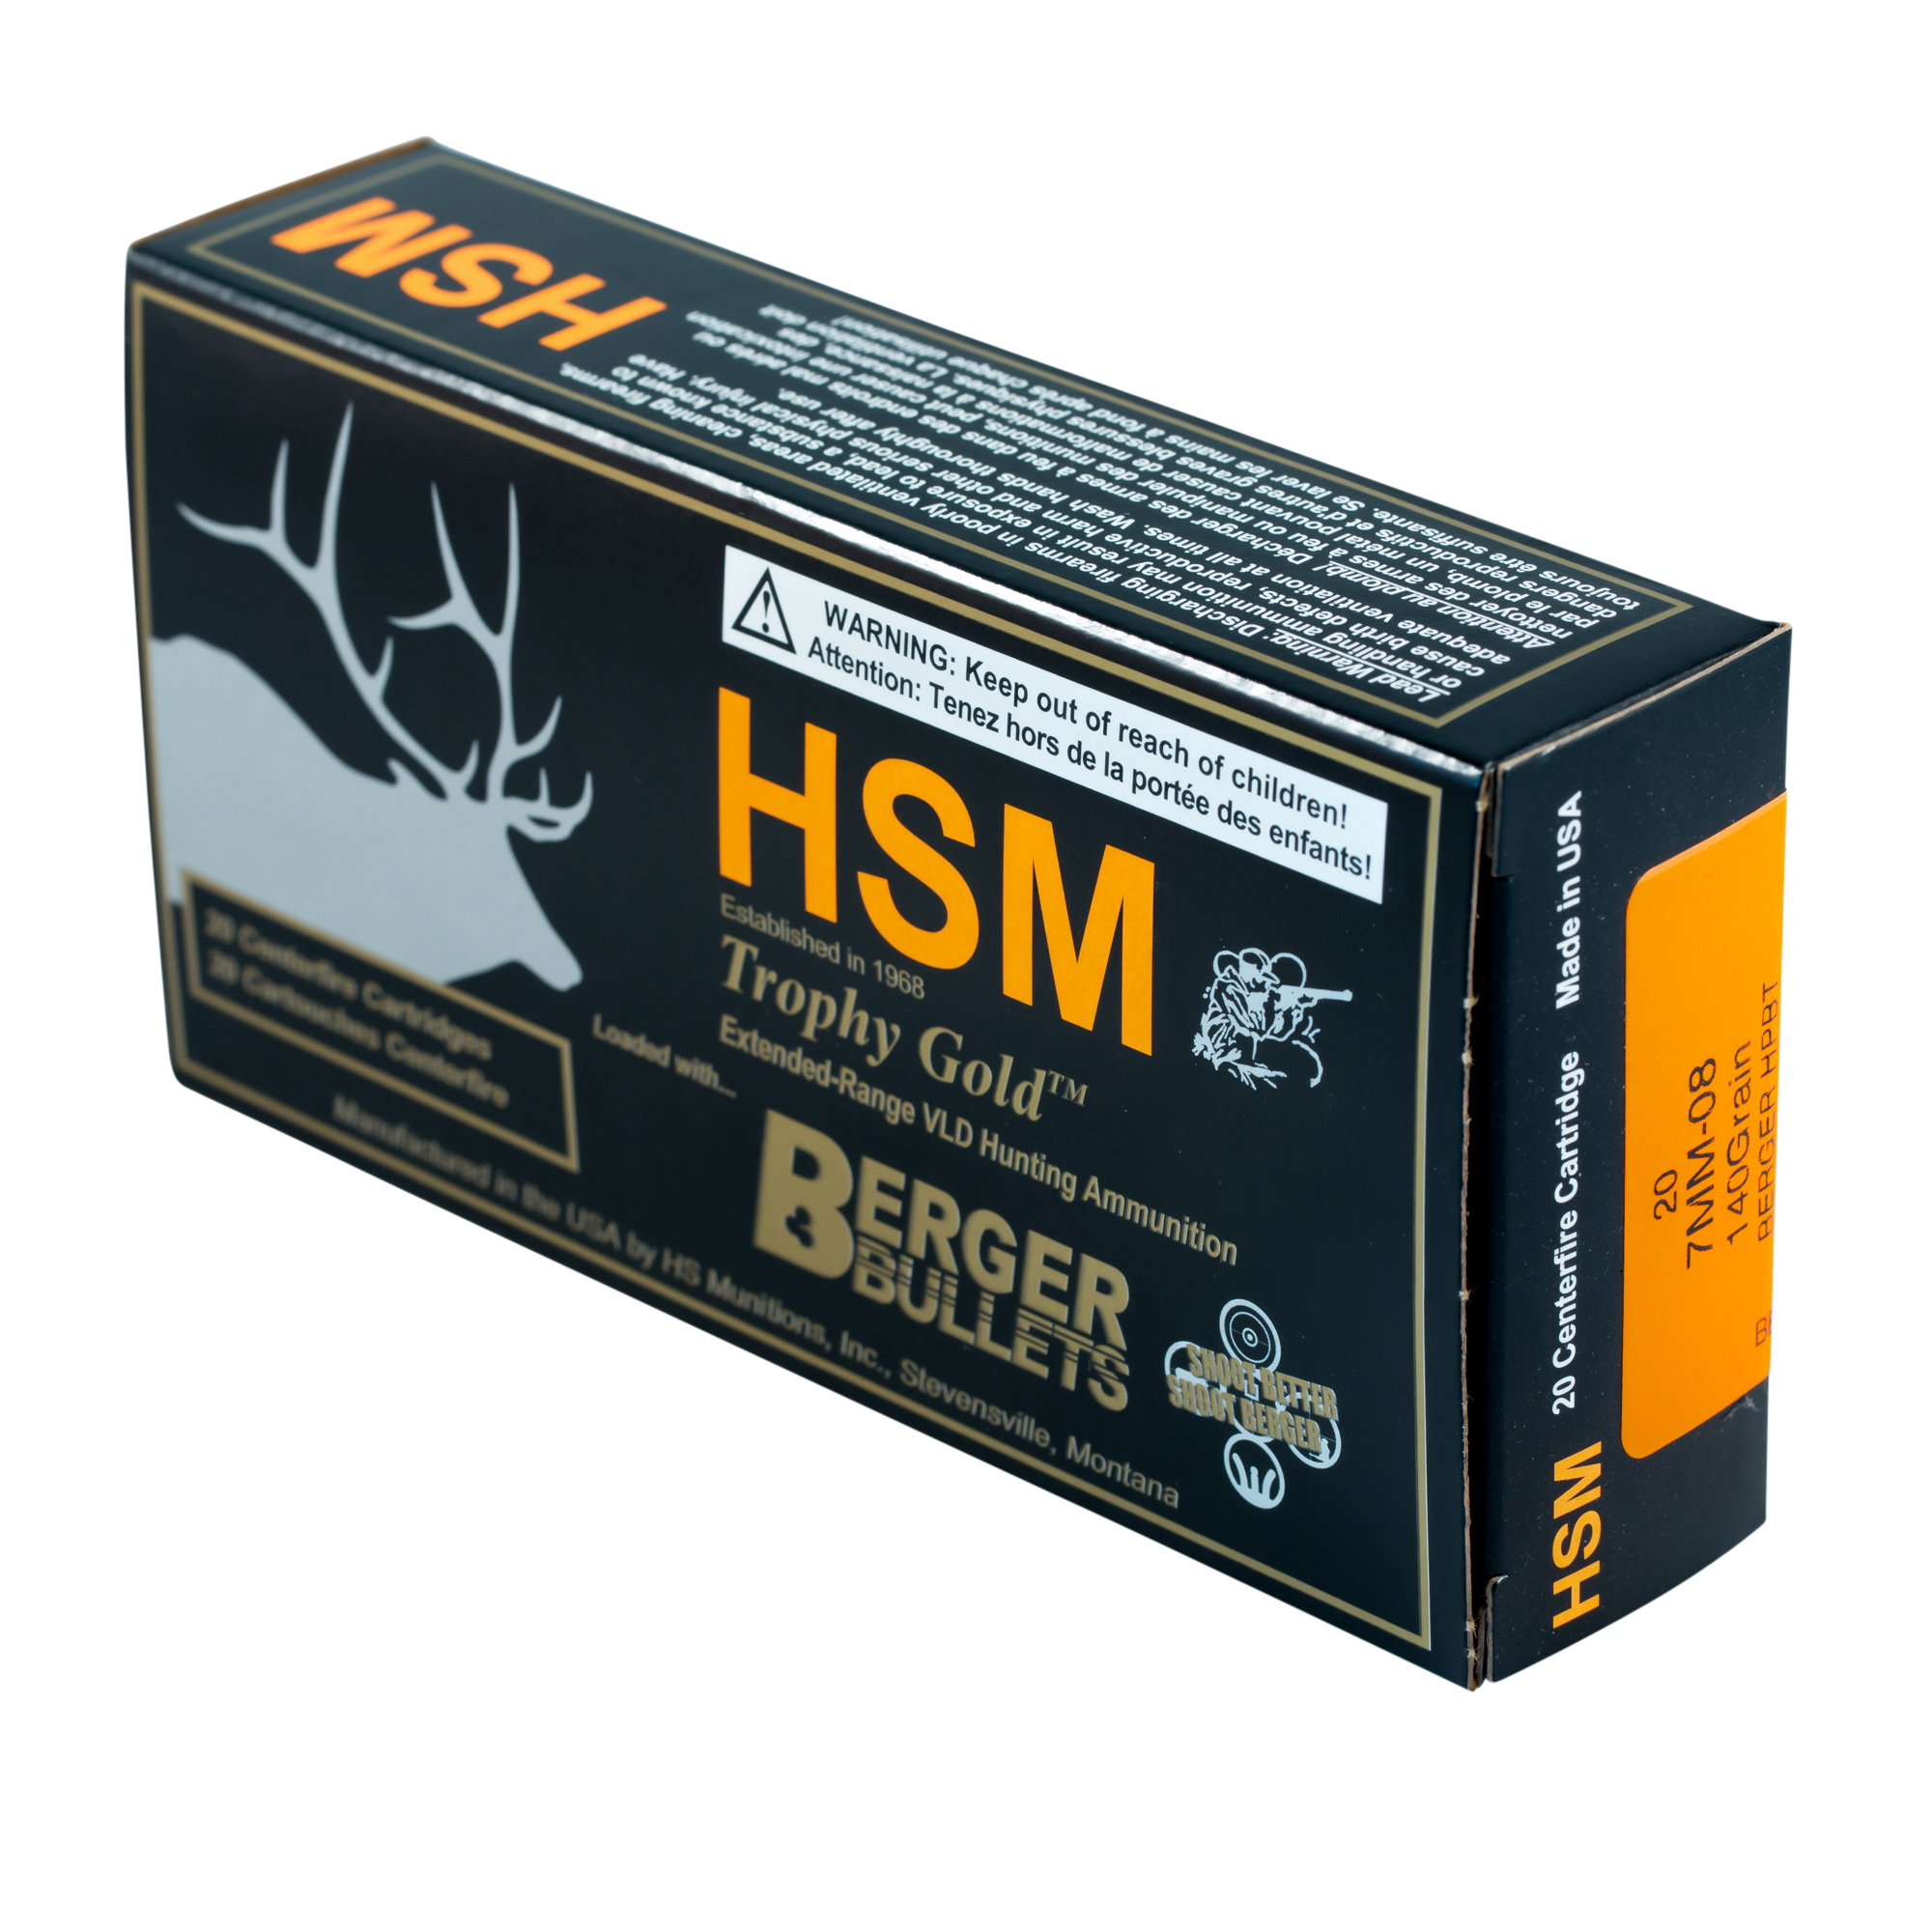 Murdoch's – HSM - 7mm-08 Rem 140 Grain Berger Hunting VLD Ammo